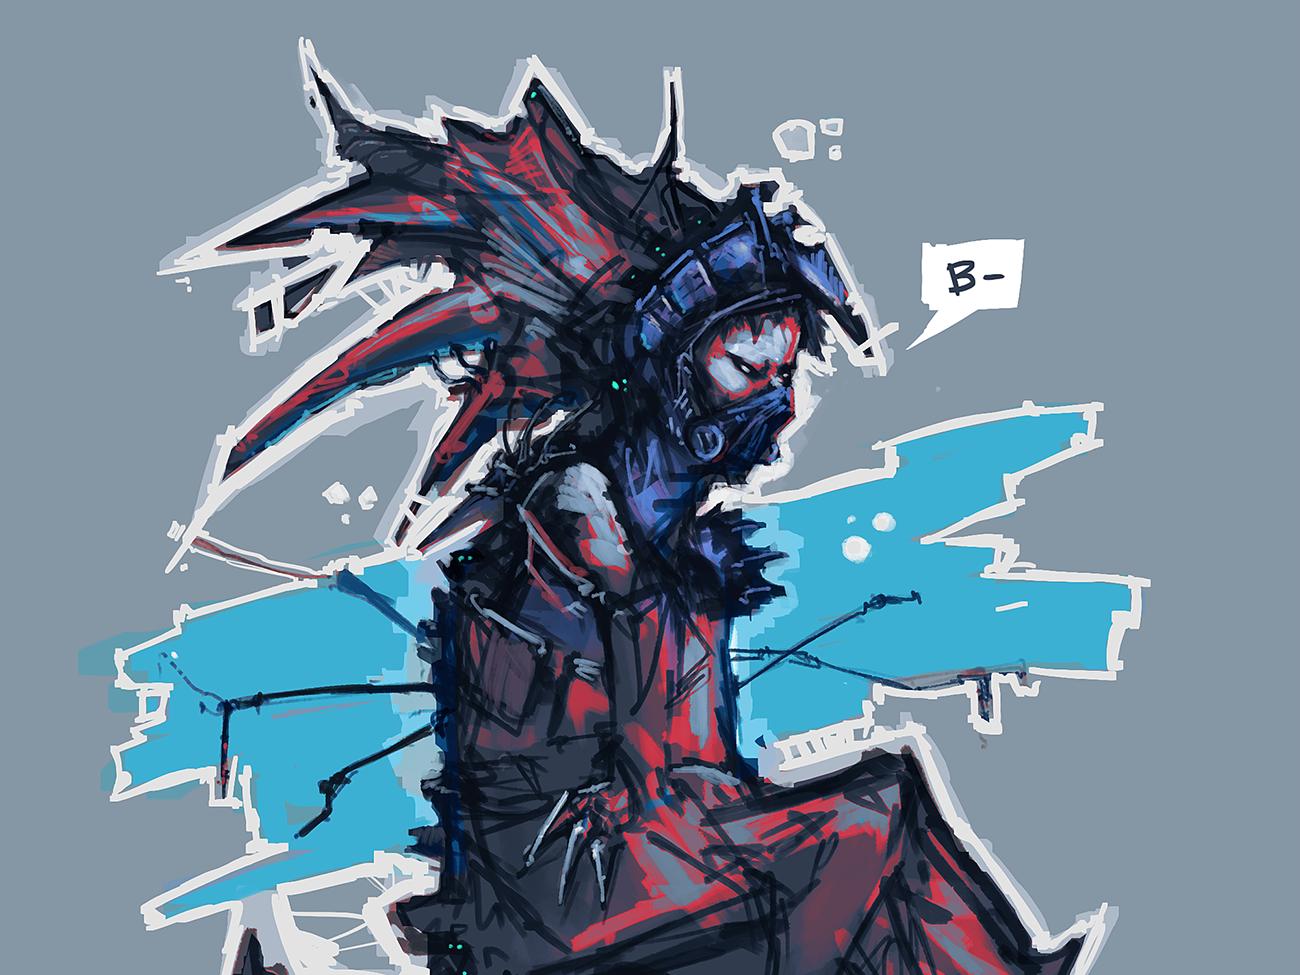 b-negative character cyberpunk scifi